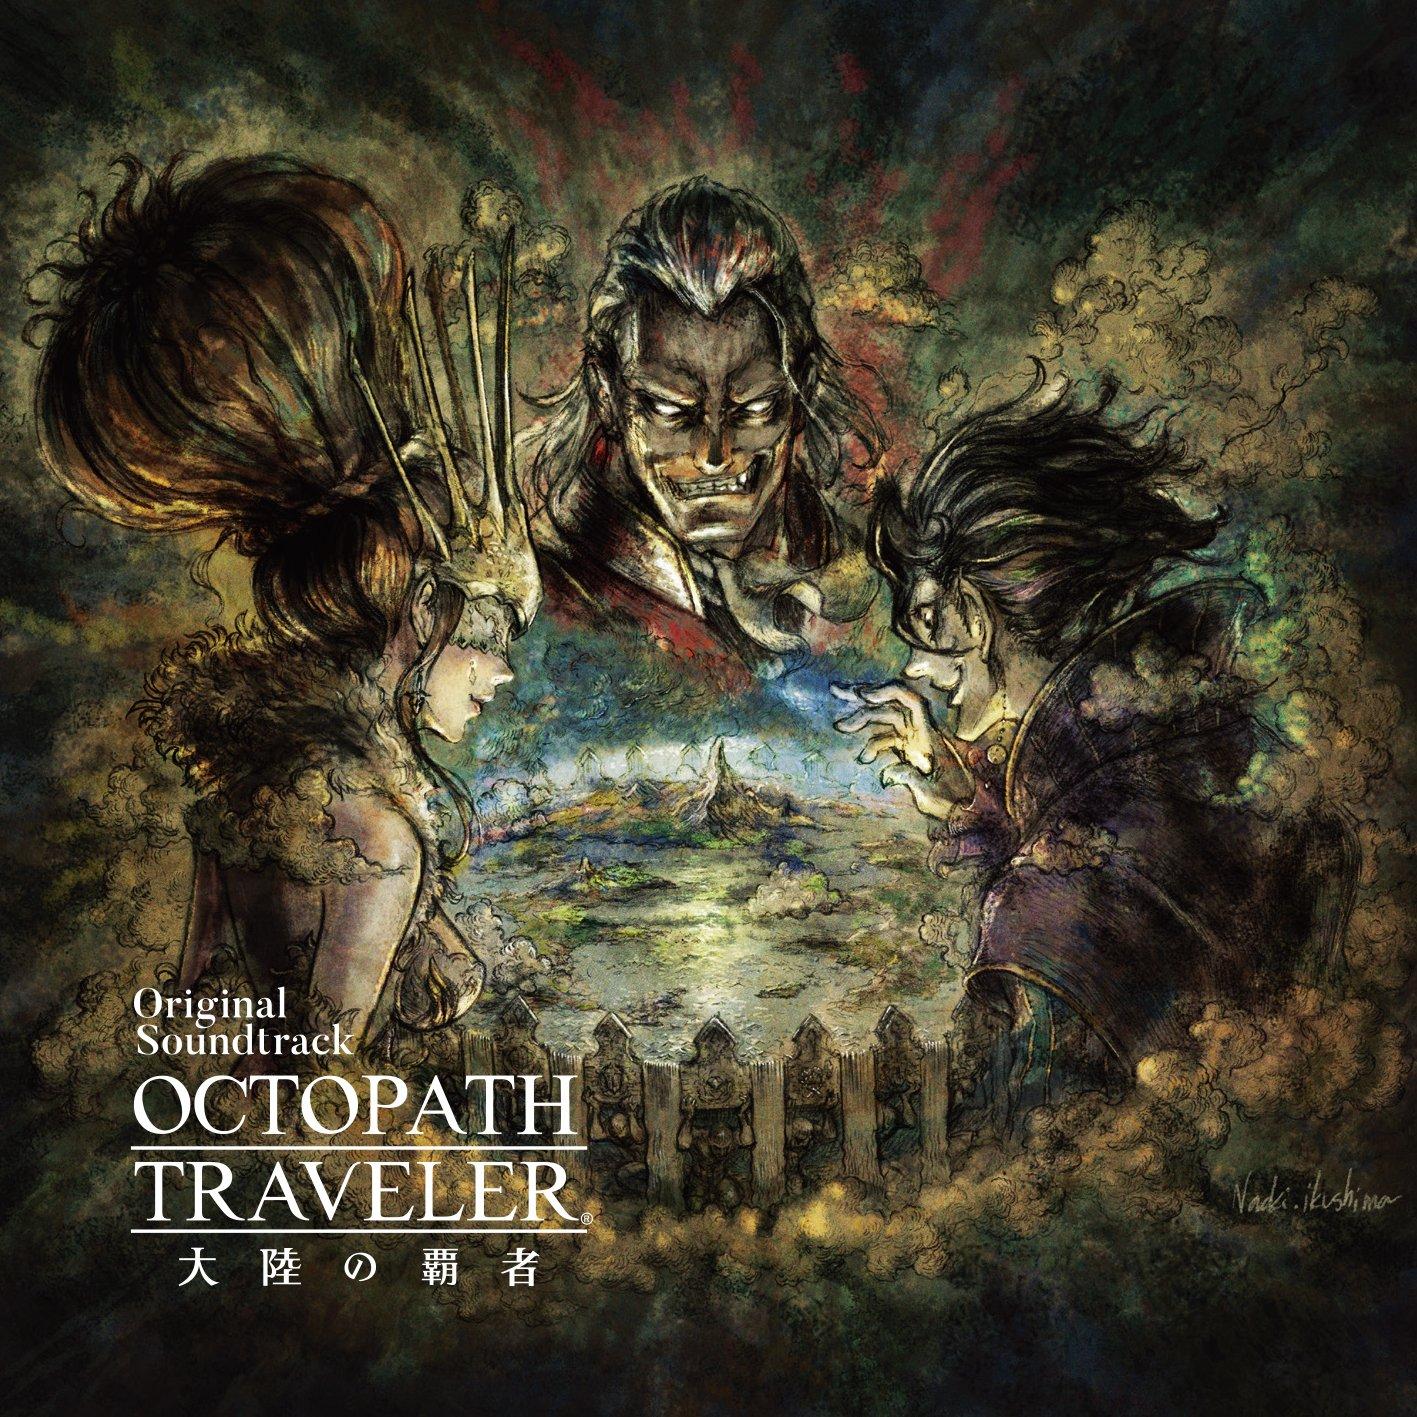 OCTOPATH TRAVELER 大陸の覇者 Original Soundtrack [2021.03.03+MP3+RAR]